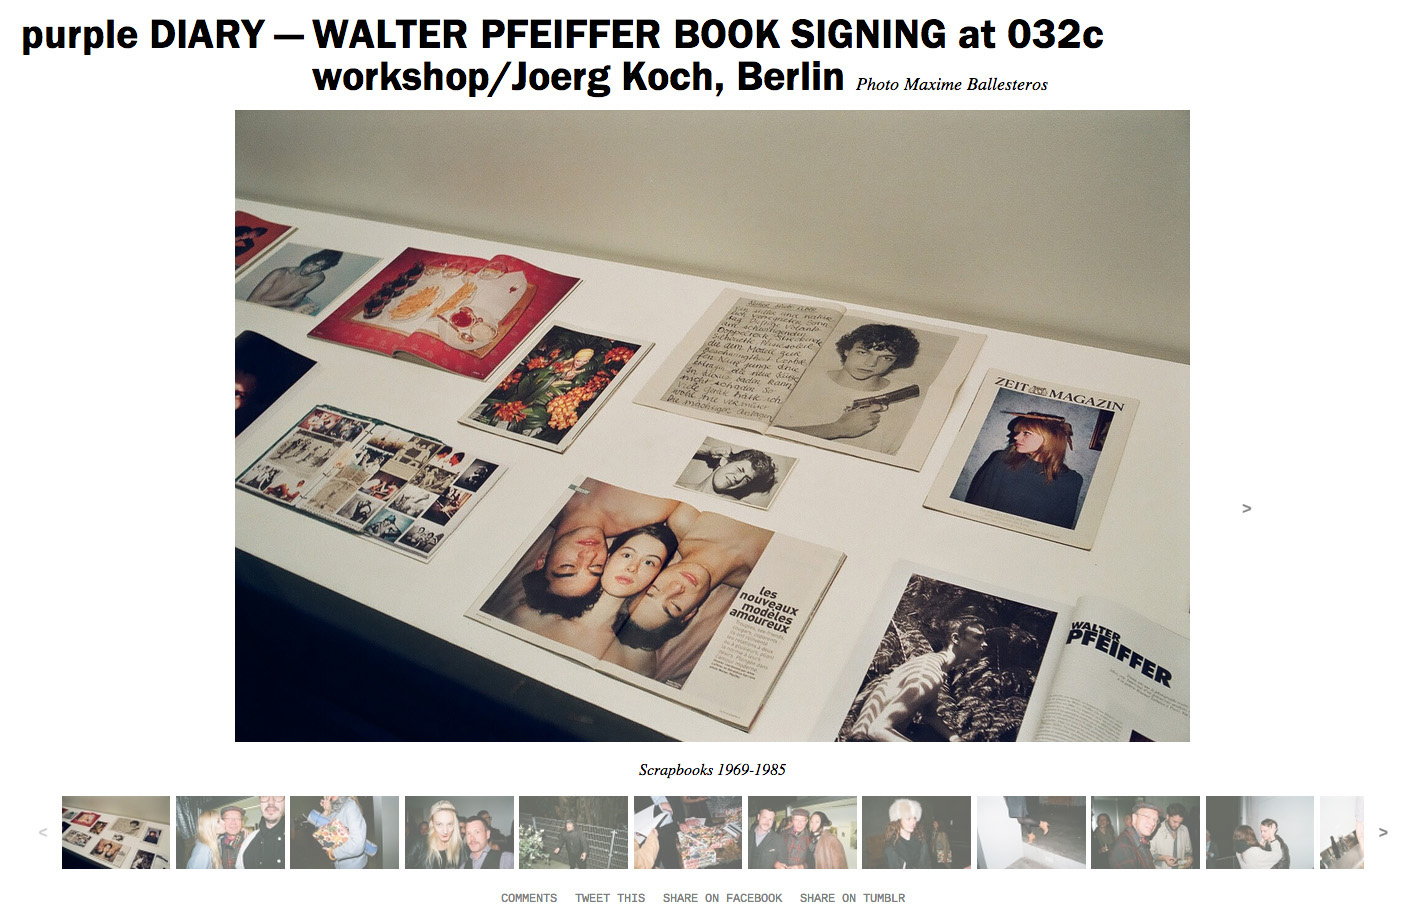 purple DIARY   WALTER PFEIFFER BOOK SIGNING at 032c workshop Joerg Koch  Berlin.jpg